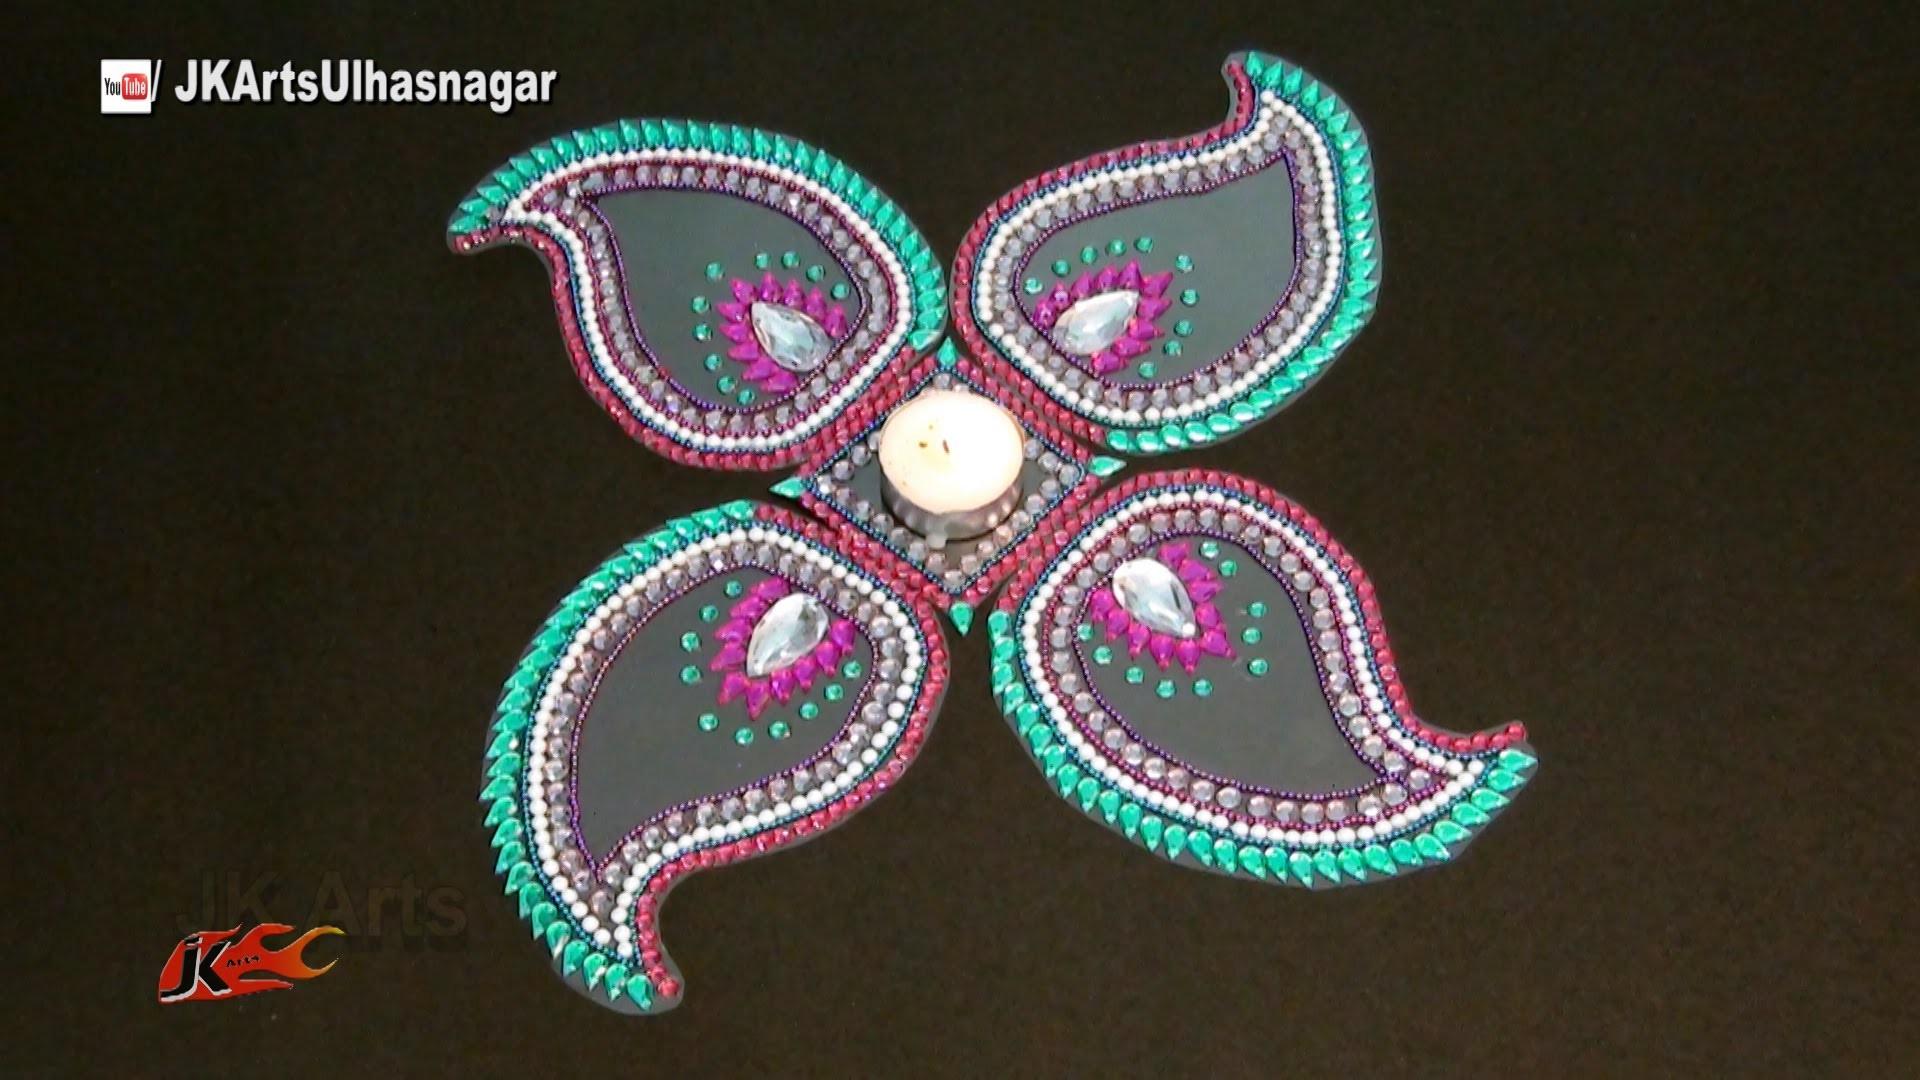 DIY Easy Rearrangeable Kundan Rangoli for Diwali   How to make   JK Arts 997